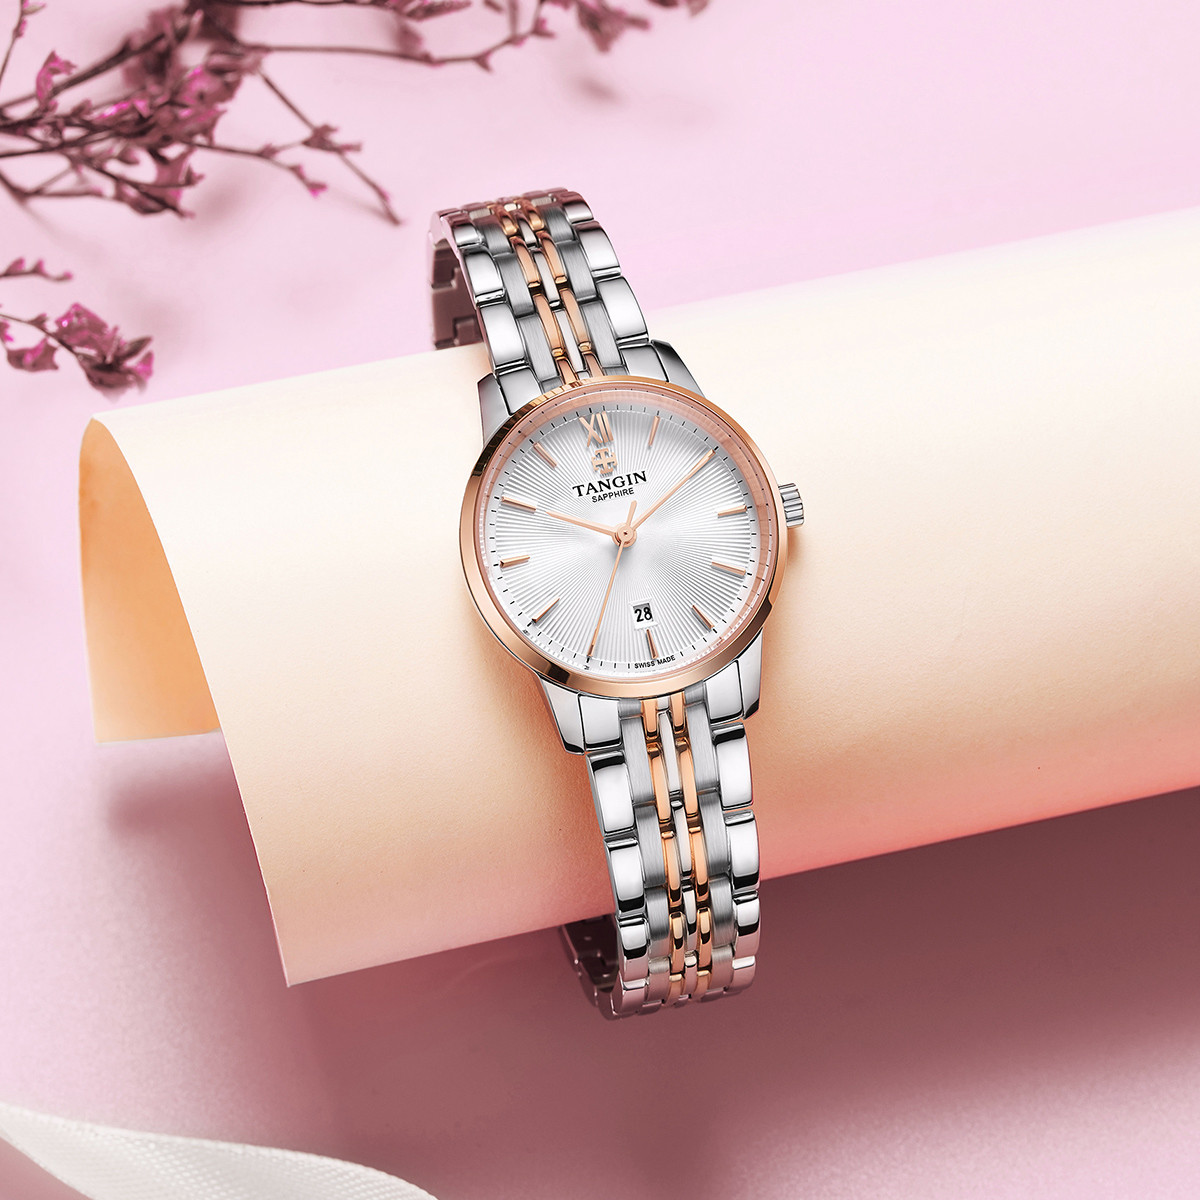 TANGIN 天珺 T1062LHWFBA 女士石英手表